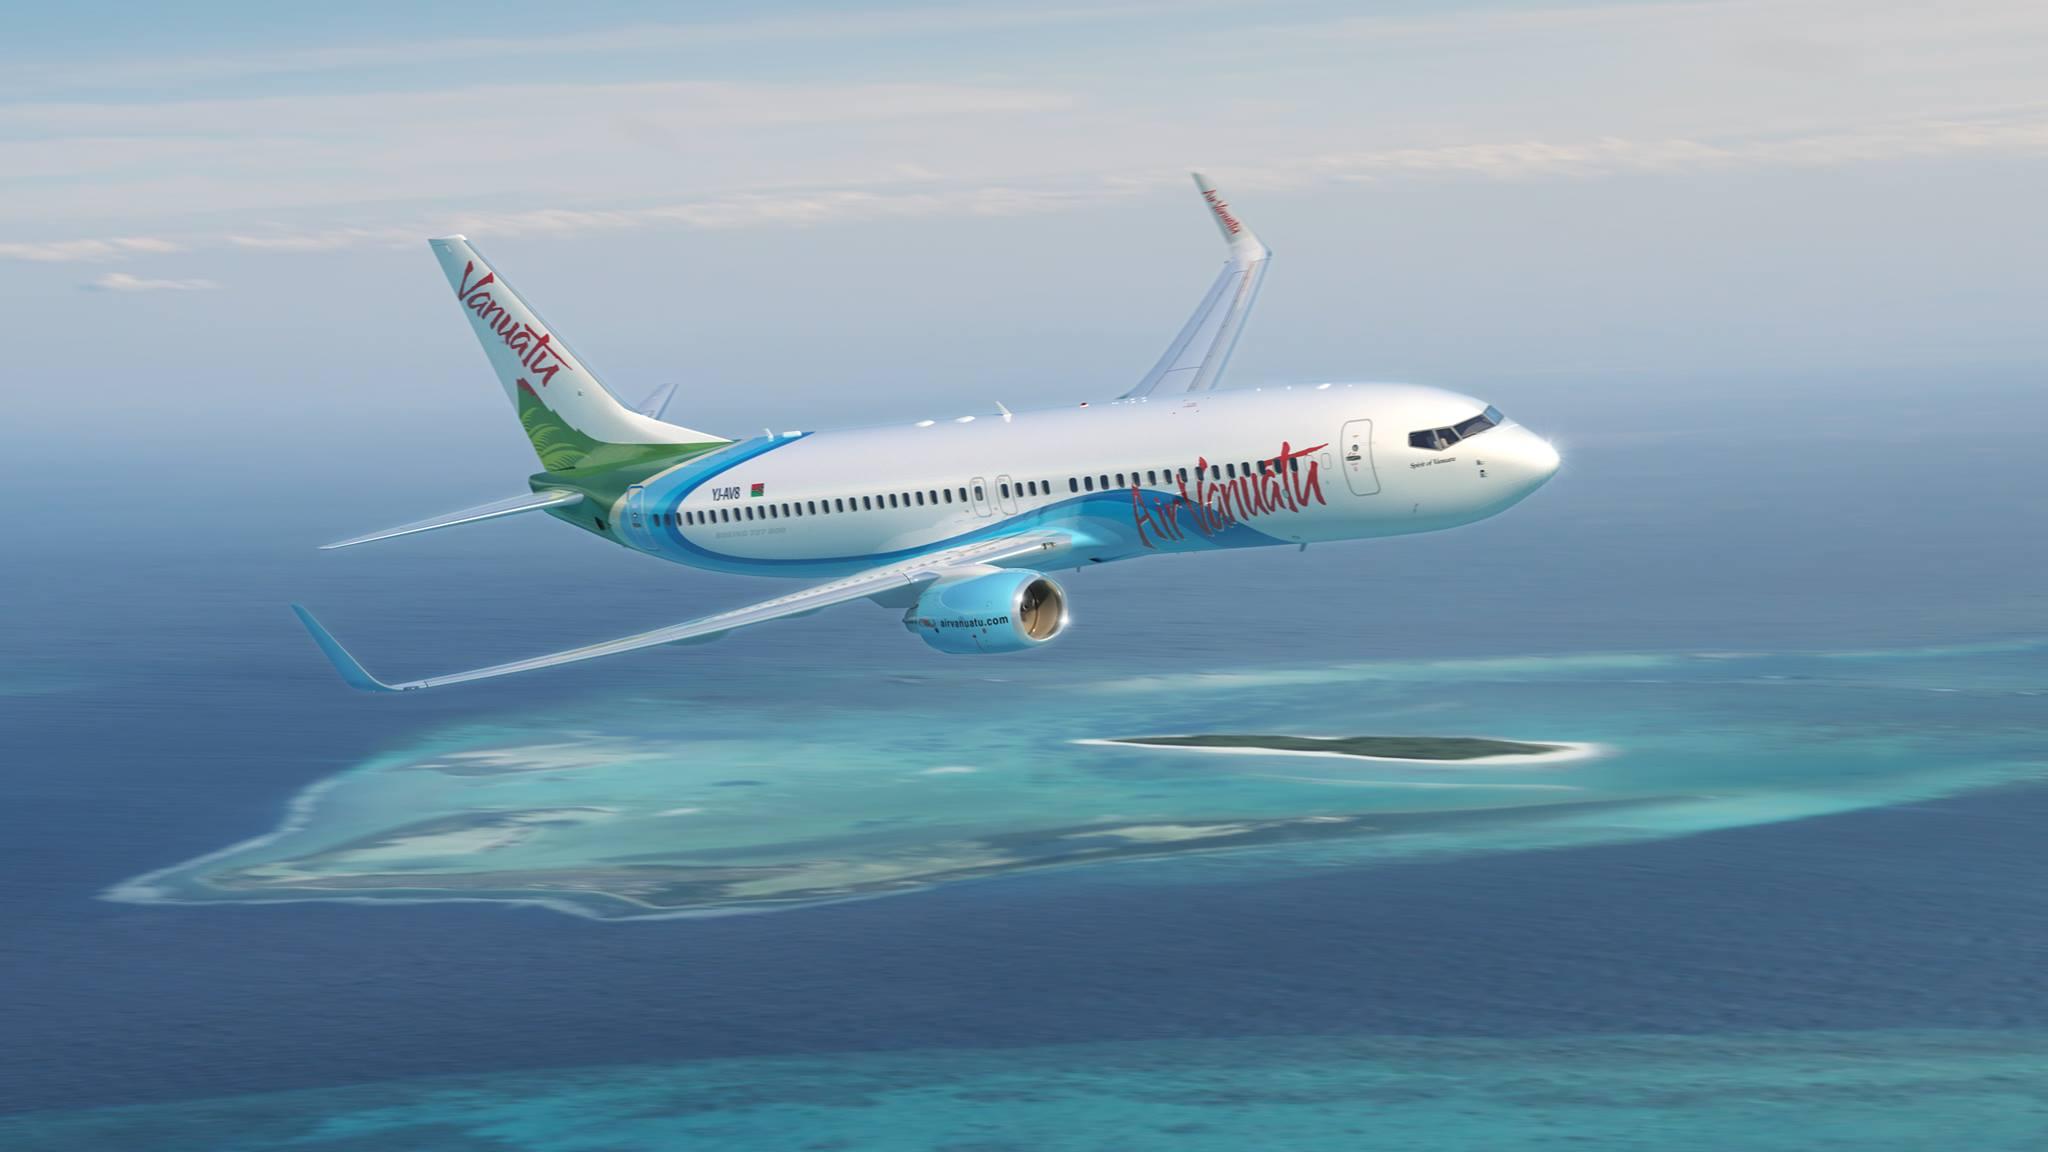 Aircalin et Air Vanuatu partagent leurs codes